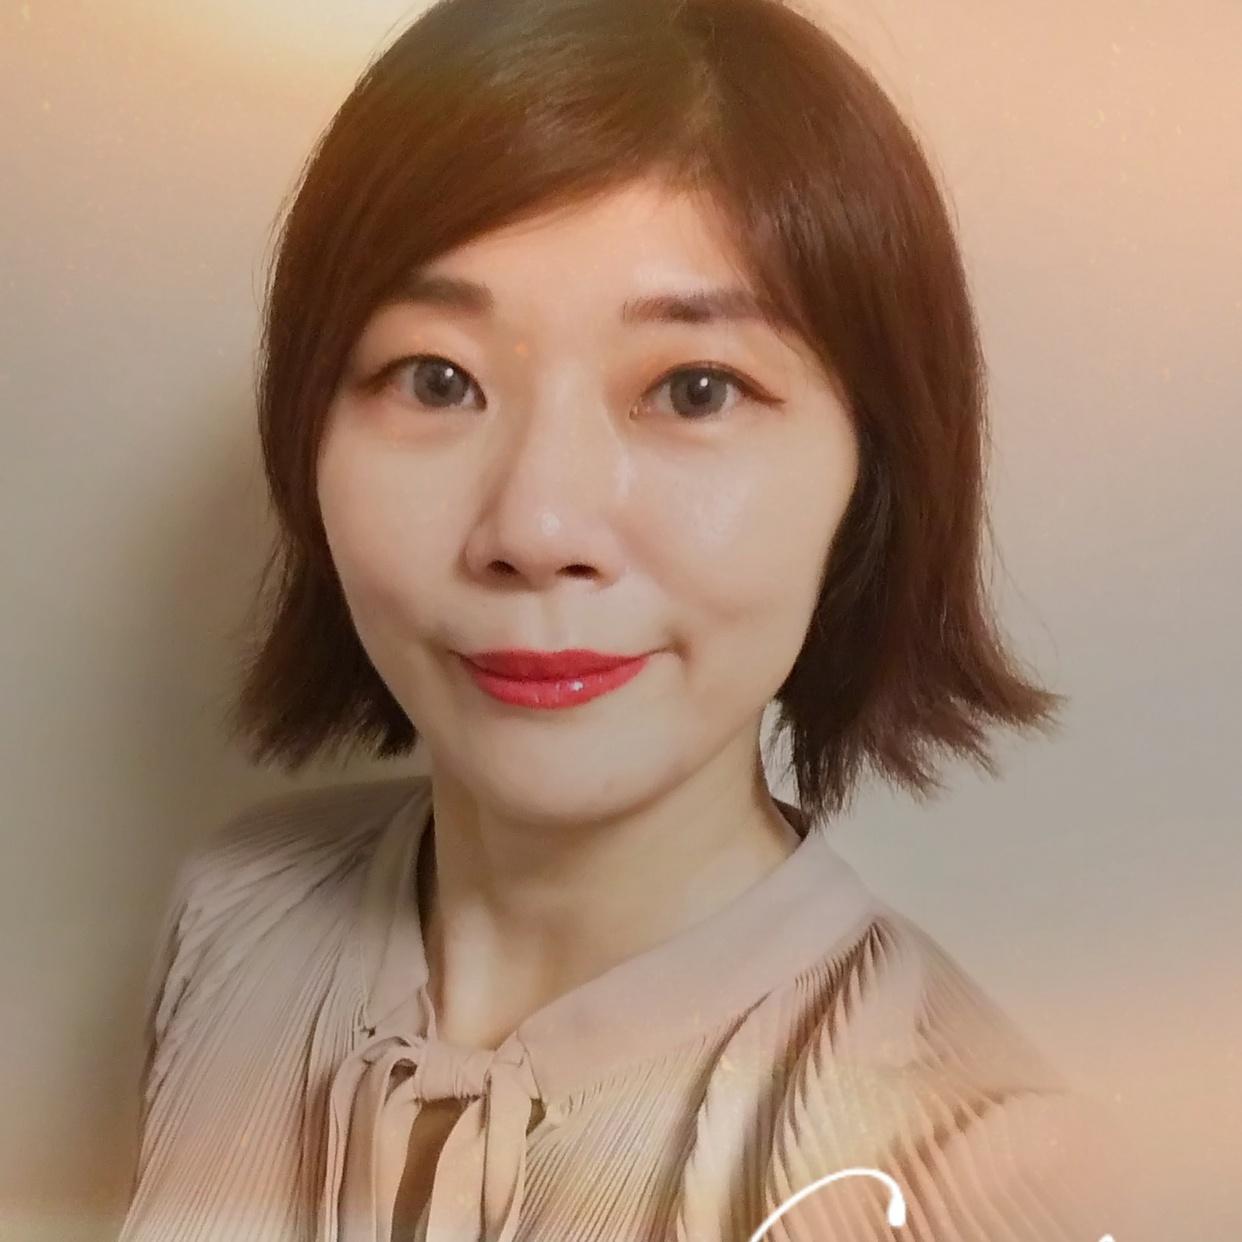 EReNA美香 / 女性のプロフィール画像